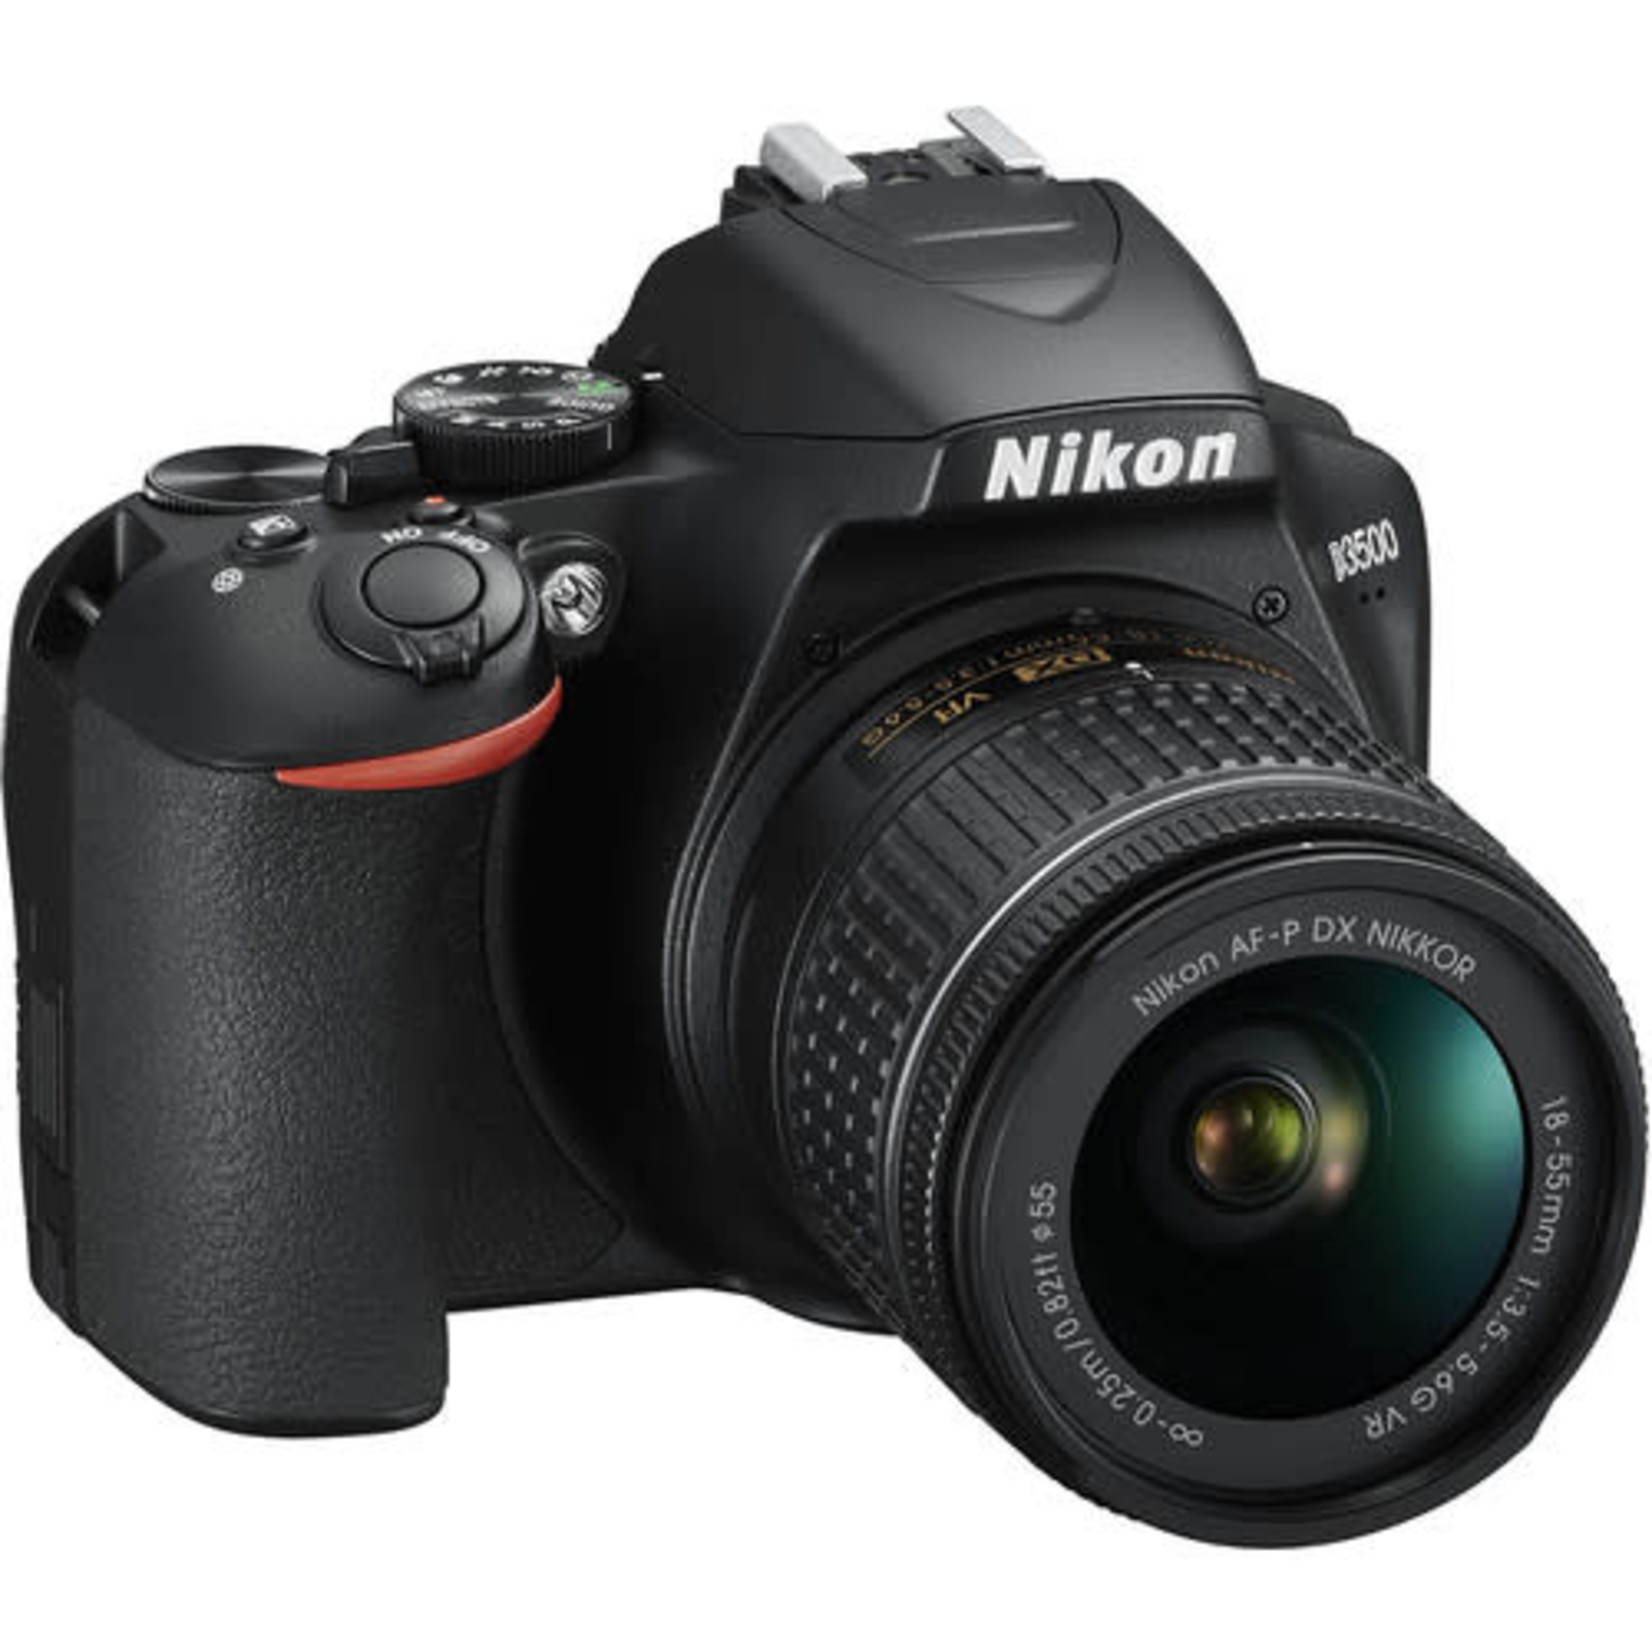 Nikon Nikon D3500 DSLR Camera with 18-55mm Lens